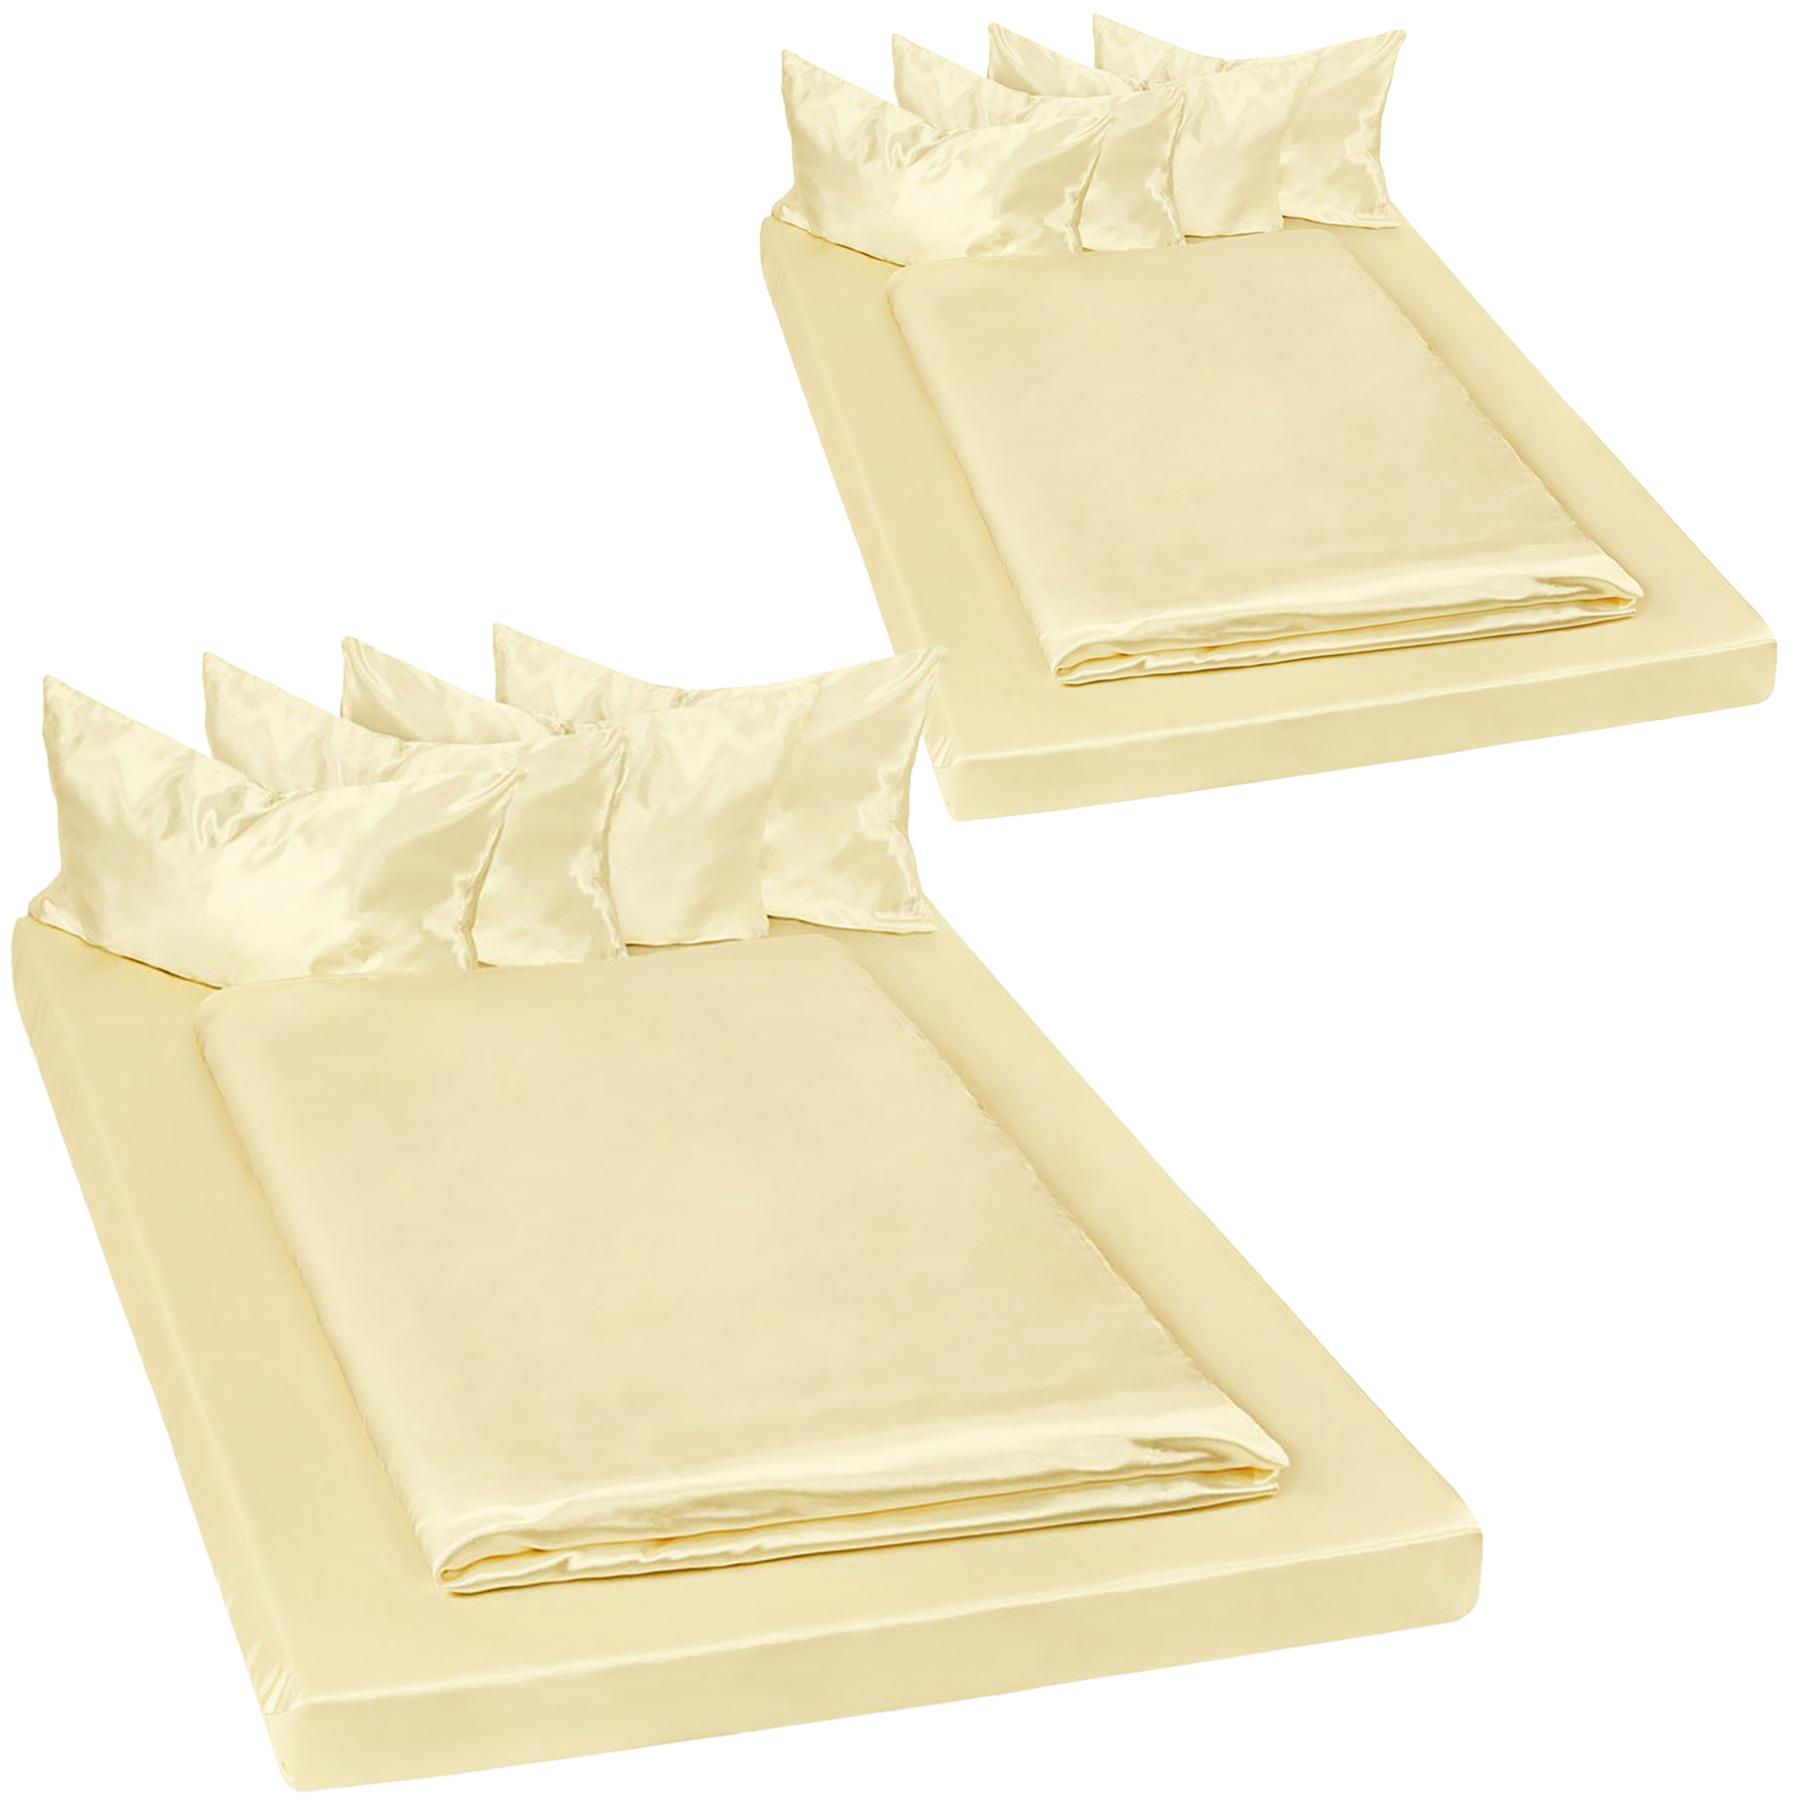 tectake 2 bäddset blank satin 200x150 cm 6-delars - gul